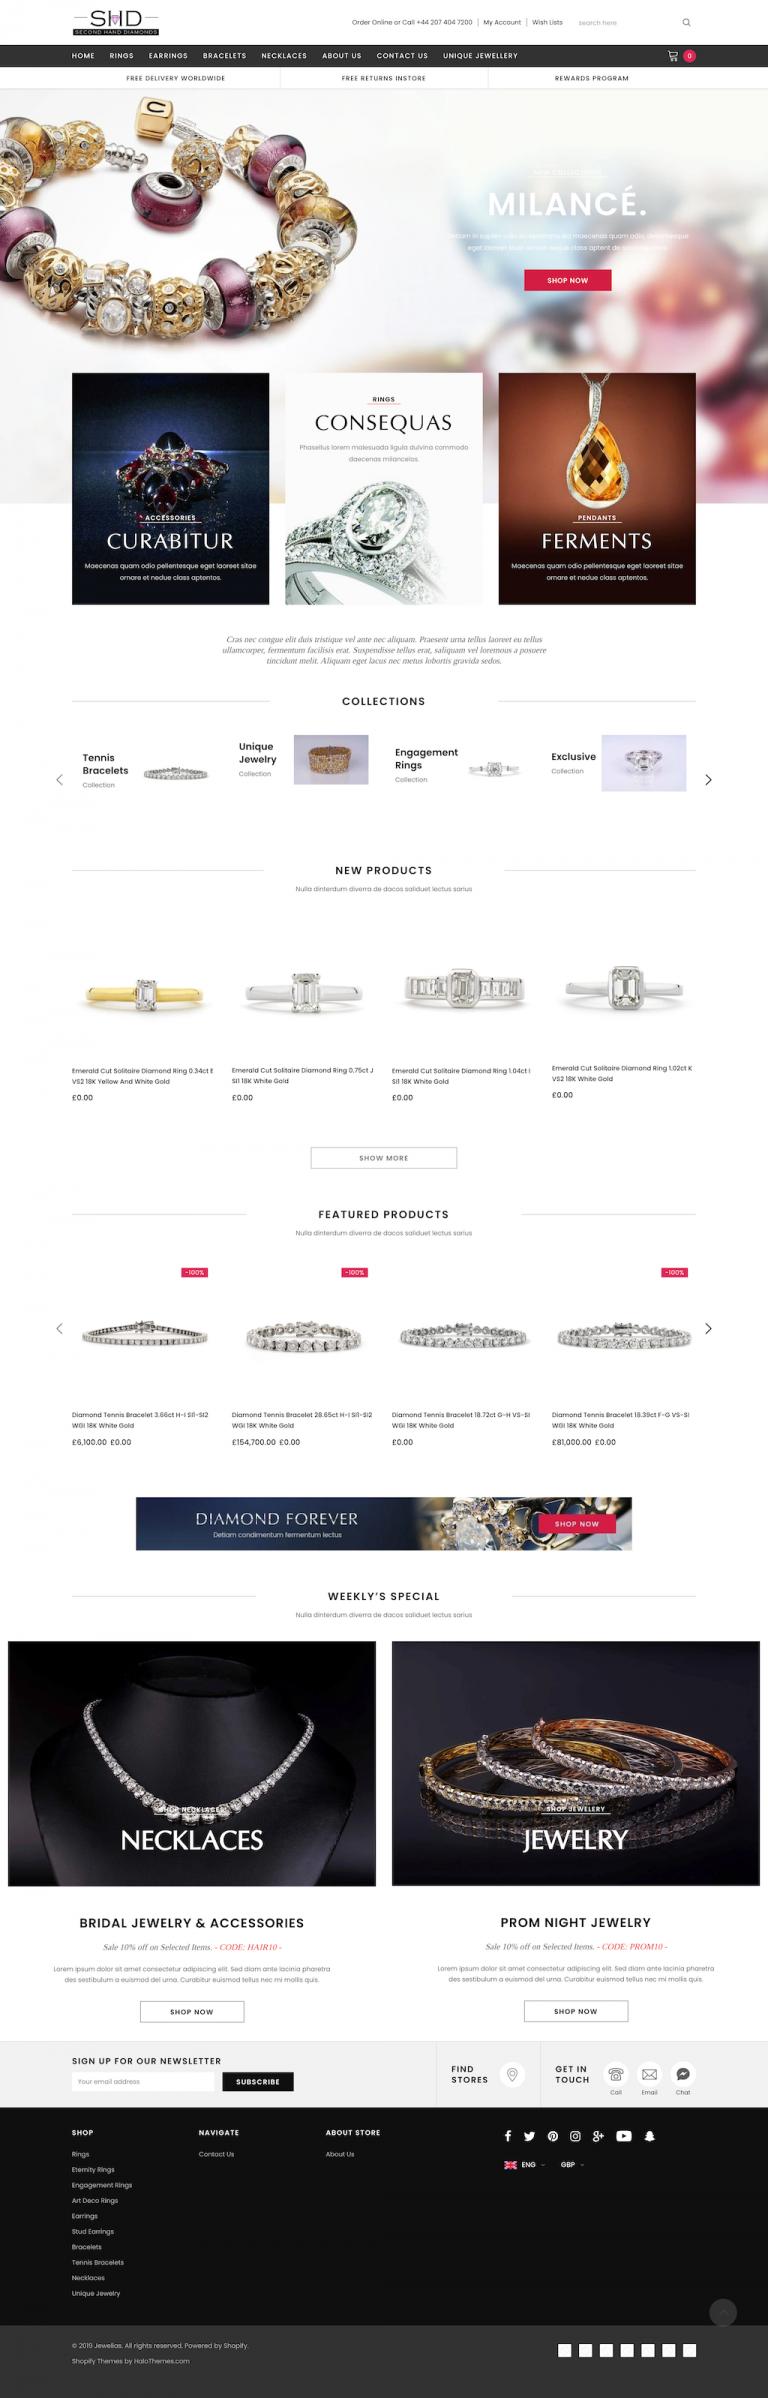 Second Hand Diamond Jewellery e-Commerce Shopify